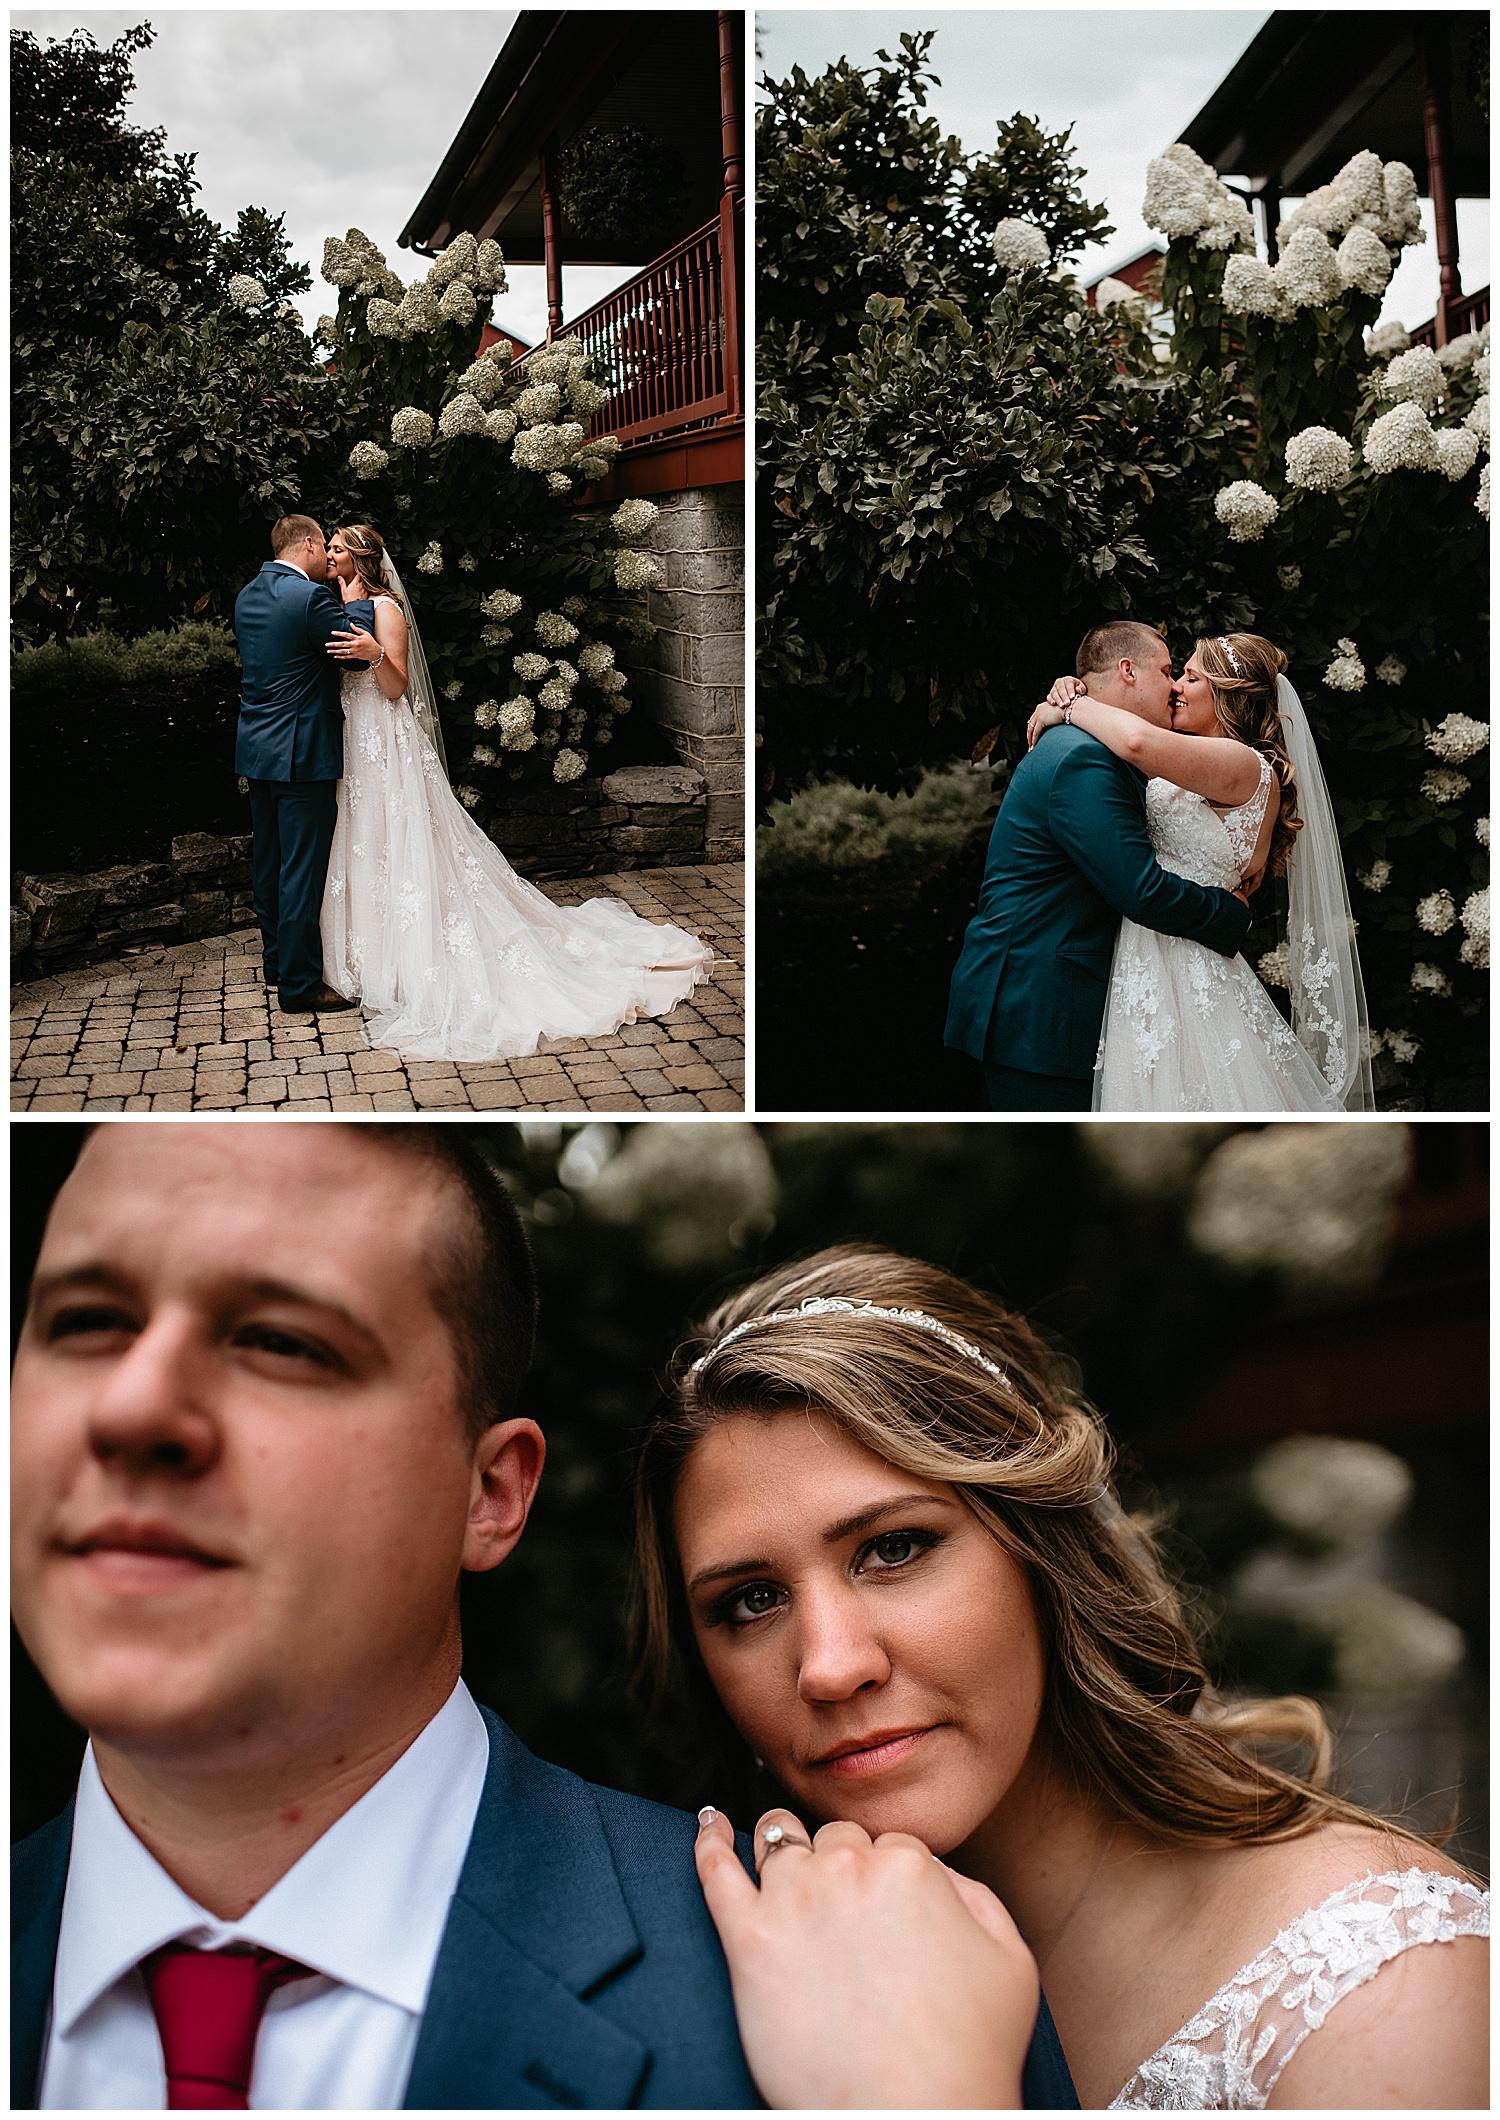 NEPA-Bloomgsburg-Wedding-Photographer-at-The-Barn-at-Greystone-Farms-Watsontown-PA_0035.jpg